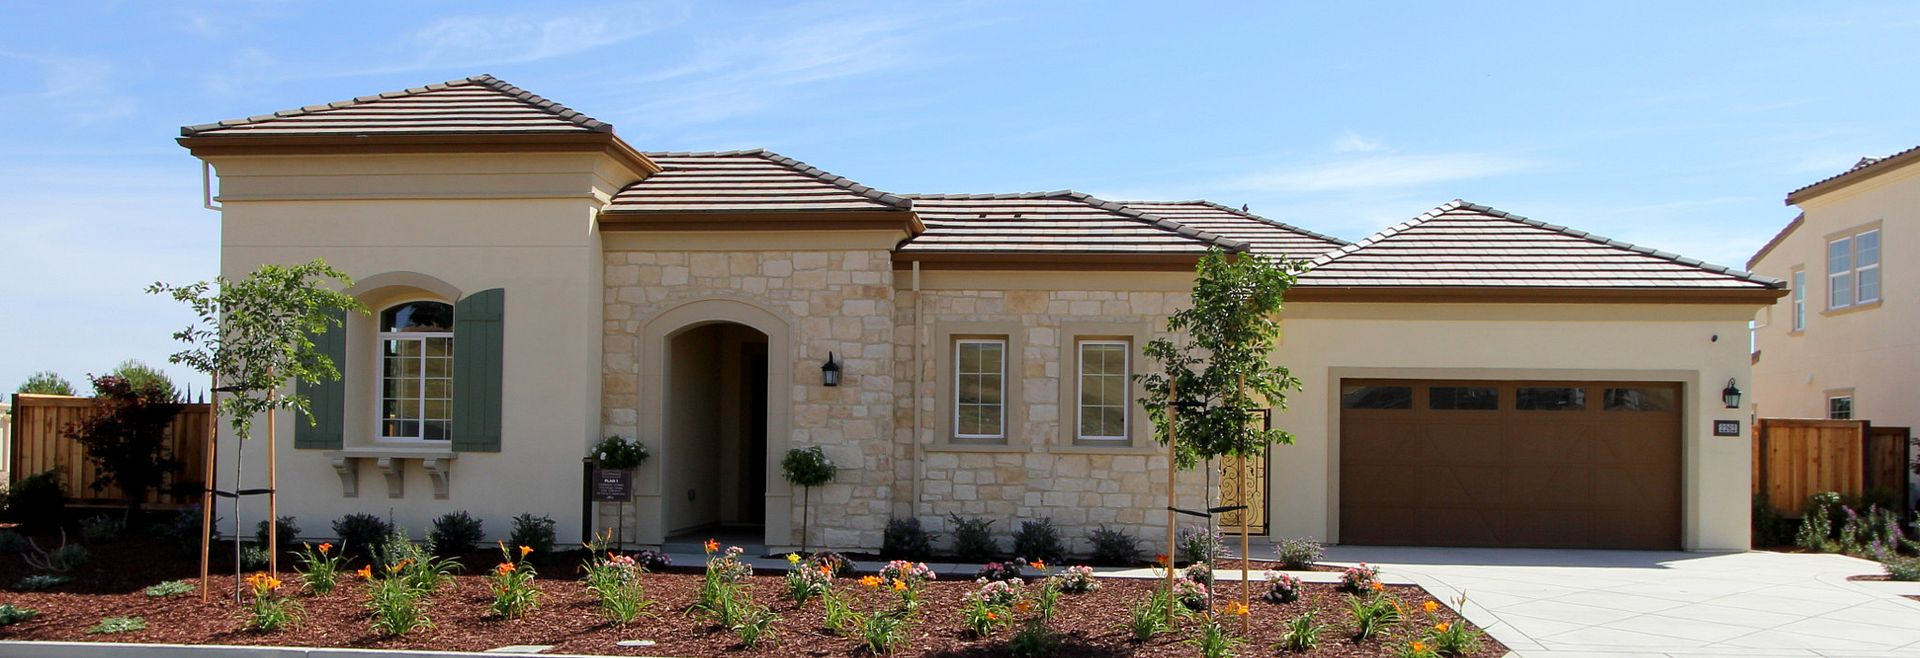 Vista Dprado by Shea Homes in Brentwood, CA